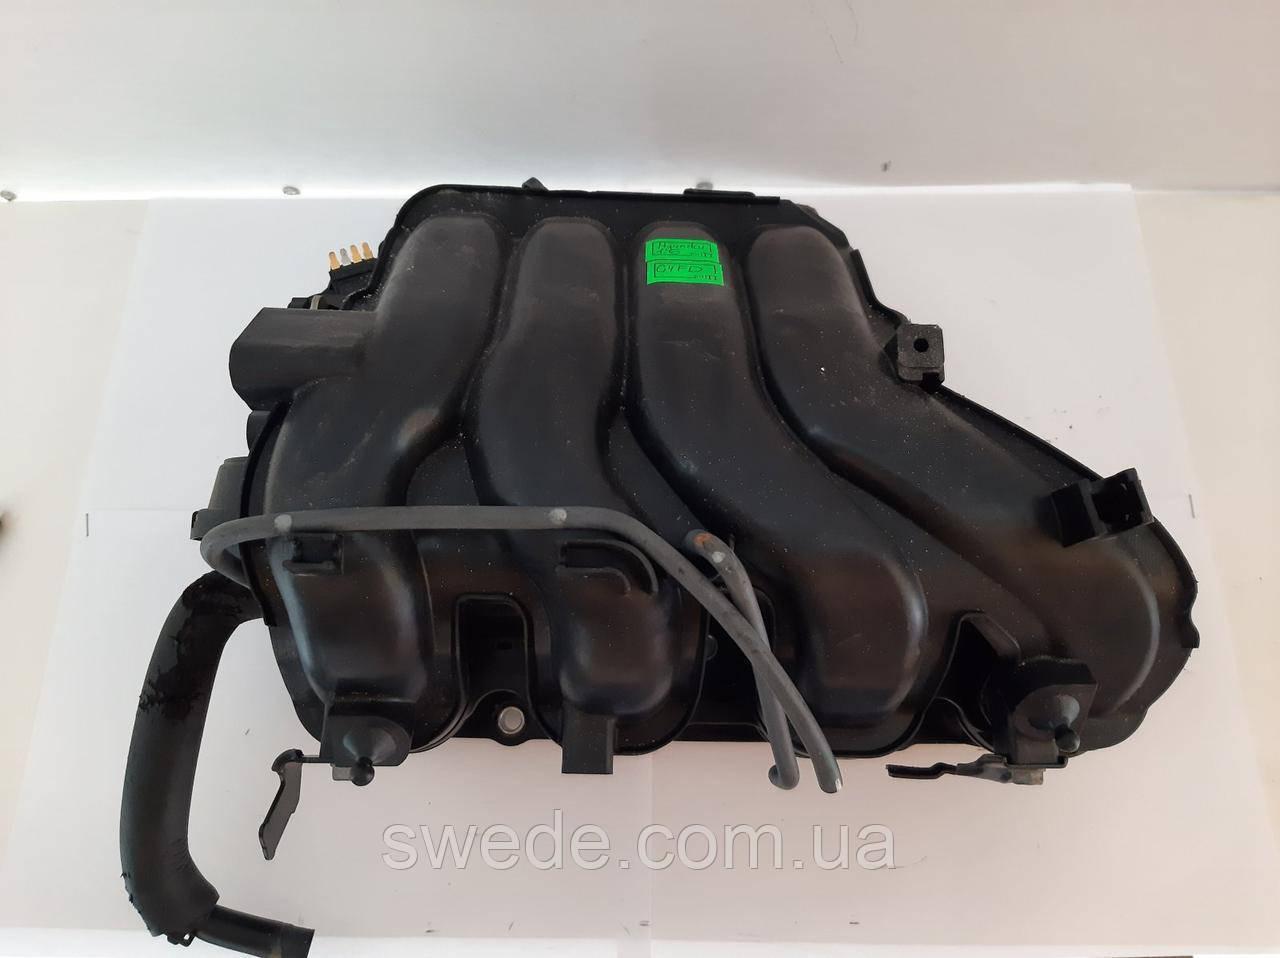 Коллектор Hyundai I30 Kia 1.6 GDI 2014 гг 283102B600